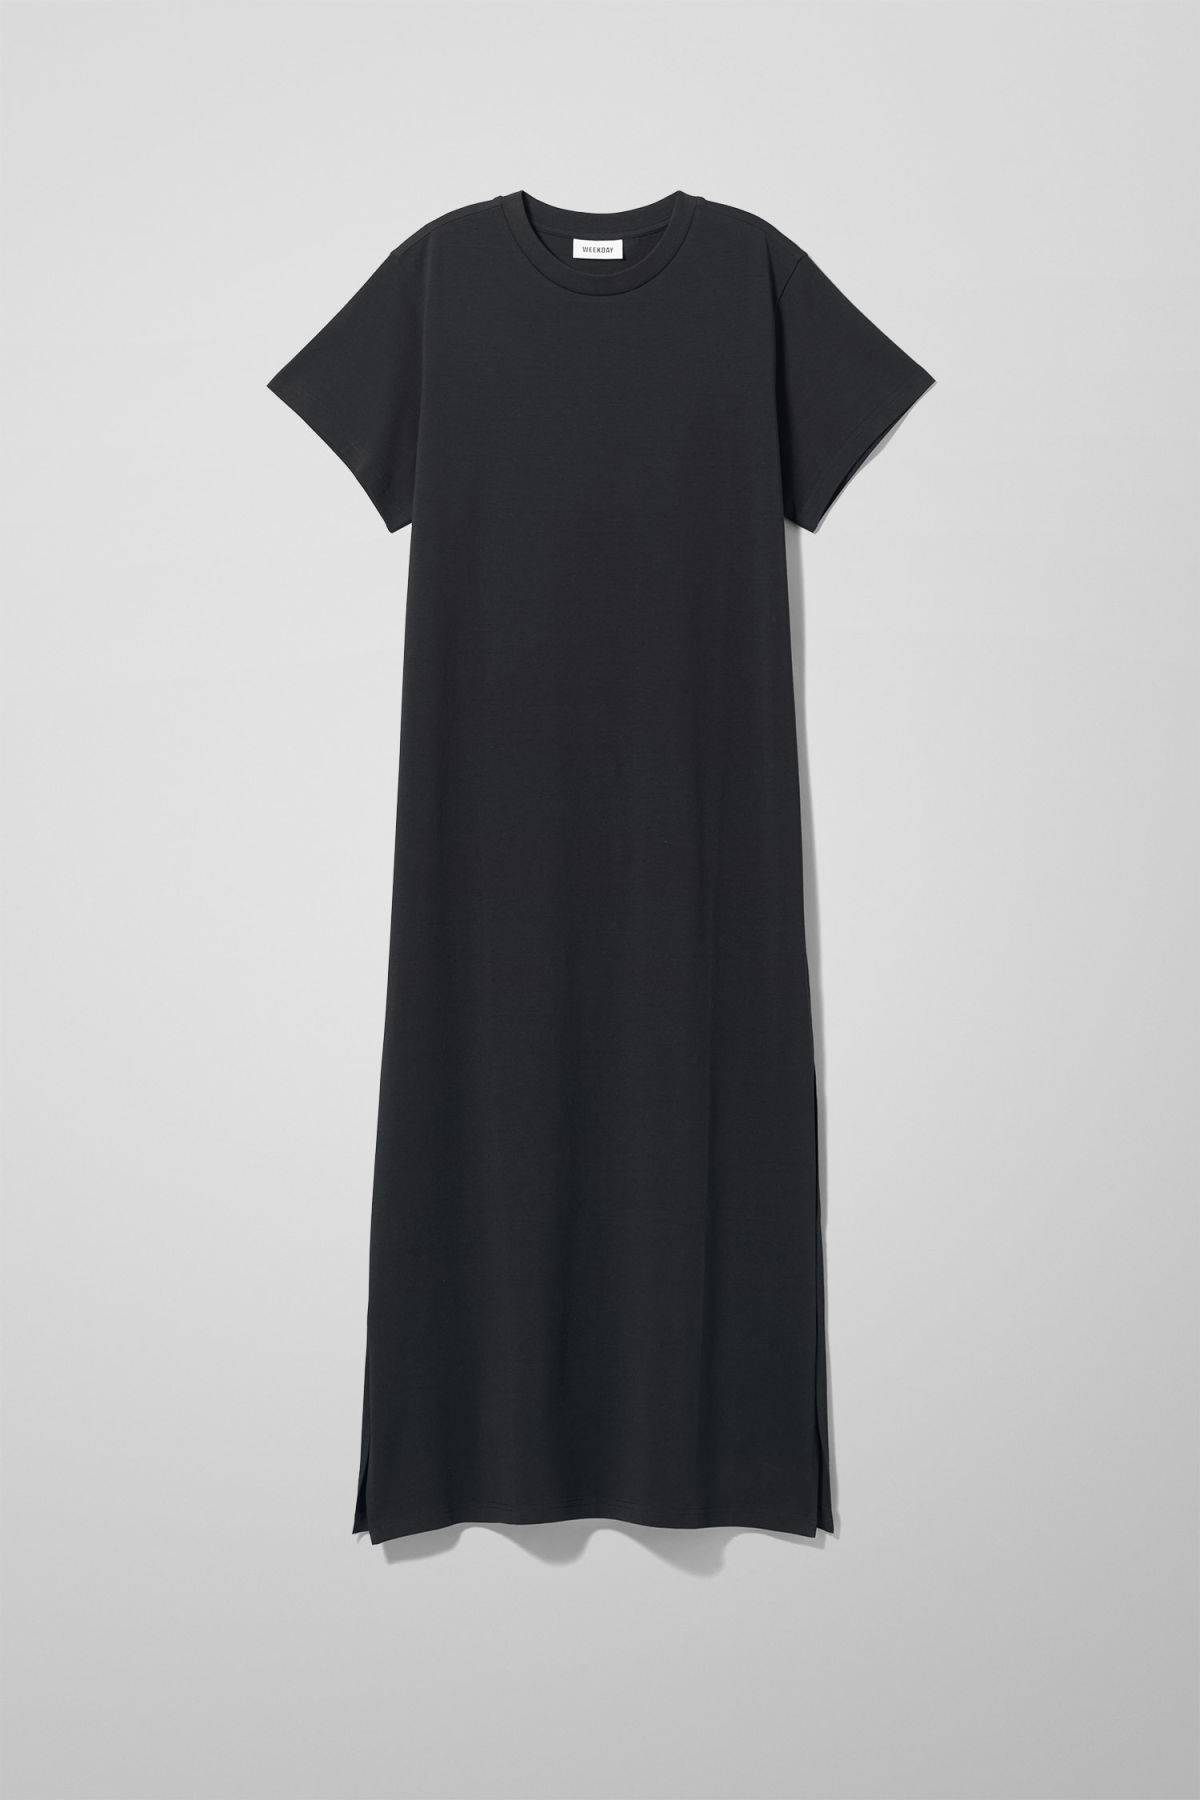 Image of Stroke Dress - Black-XS